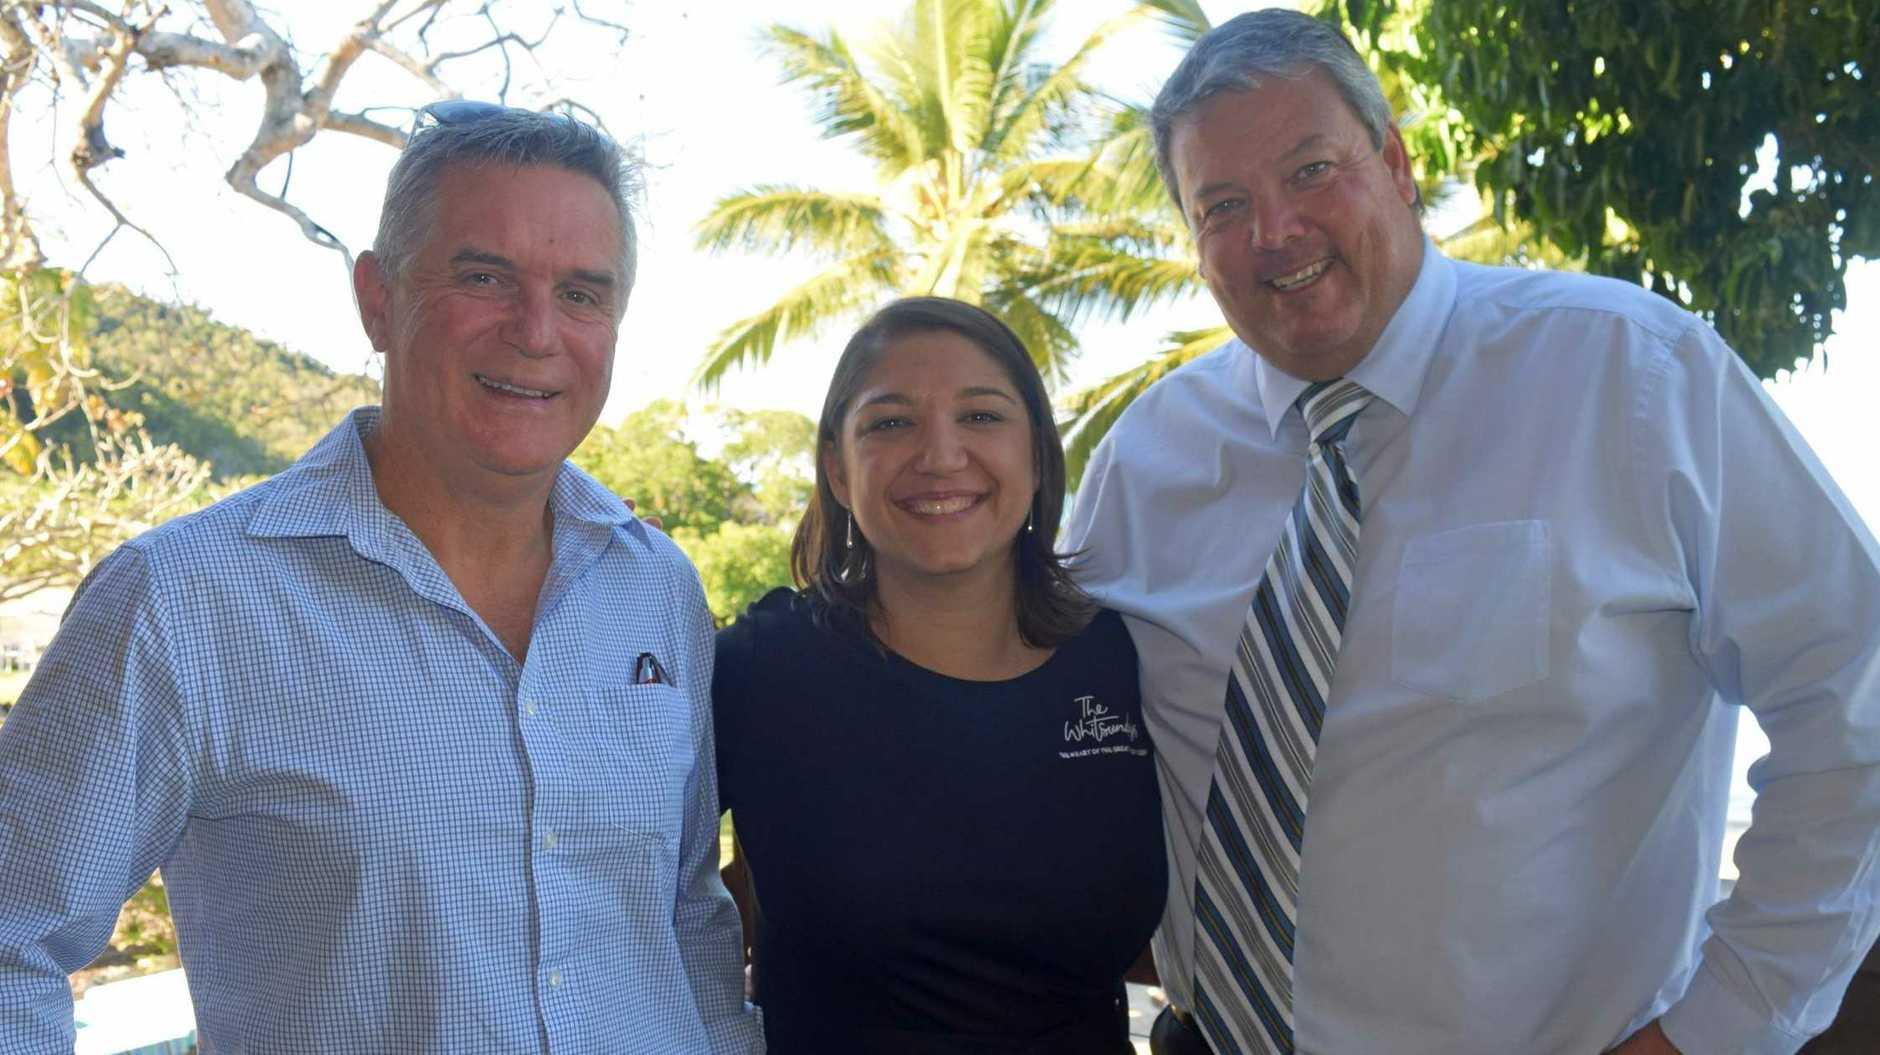 Tourism Whitsundays chairman Al Grundy, chief executive officer Tash Wheeler and Whitsunday Regional Council Mayor Andrew Willcox celebrated record numbers at the 2019 Whitsunday Tourism Awards.